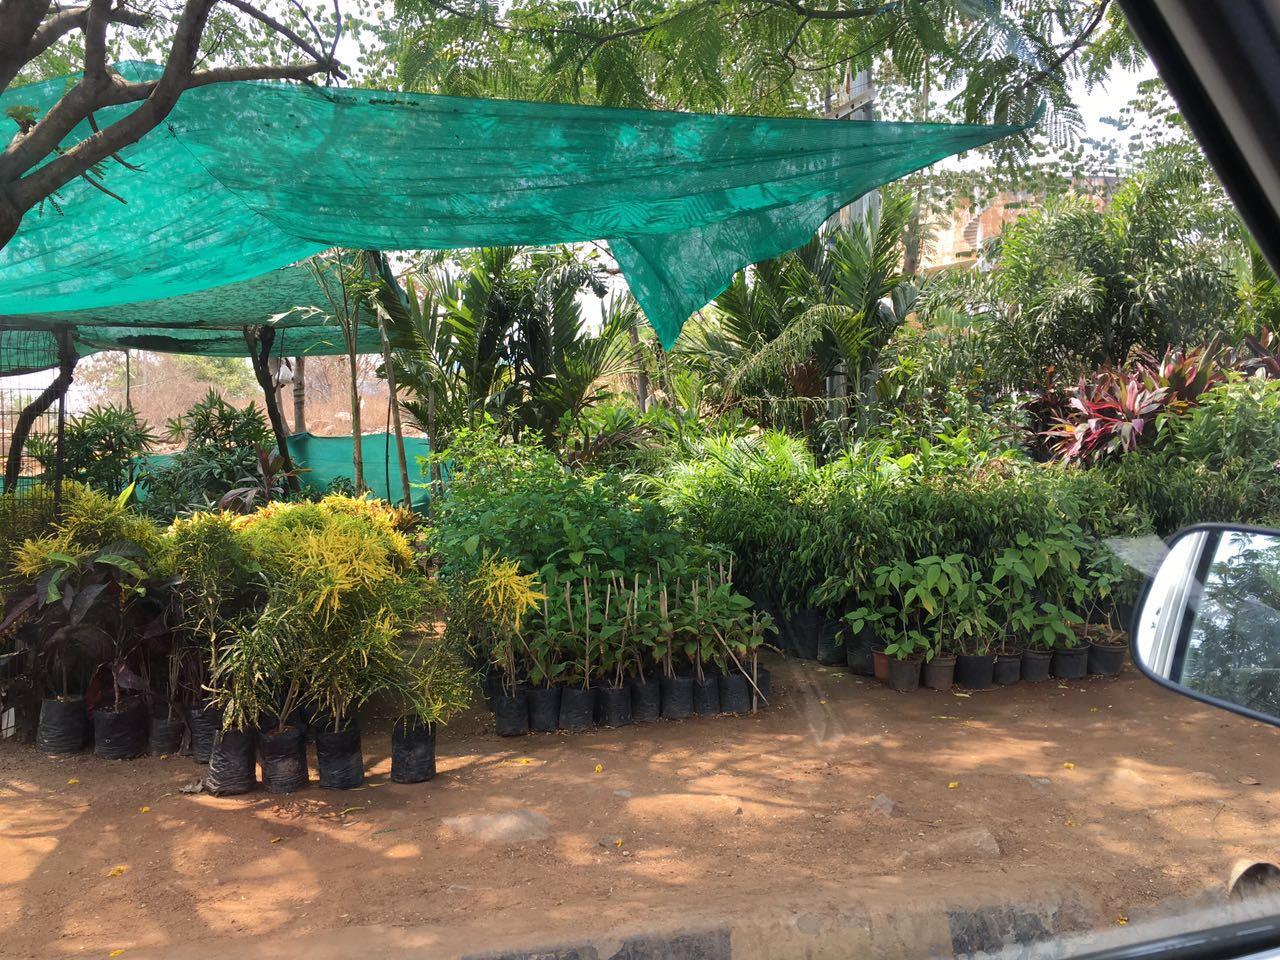 Flower market @ Kukatpally, Hyderabad